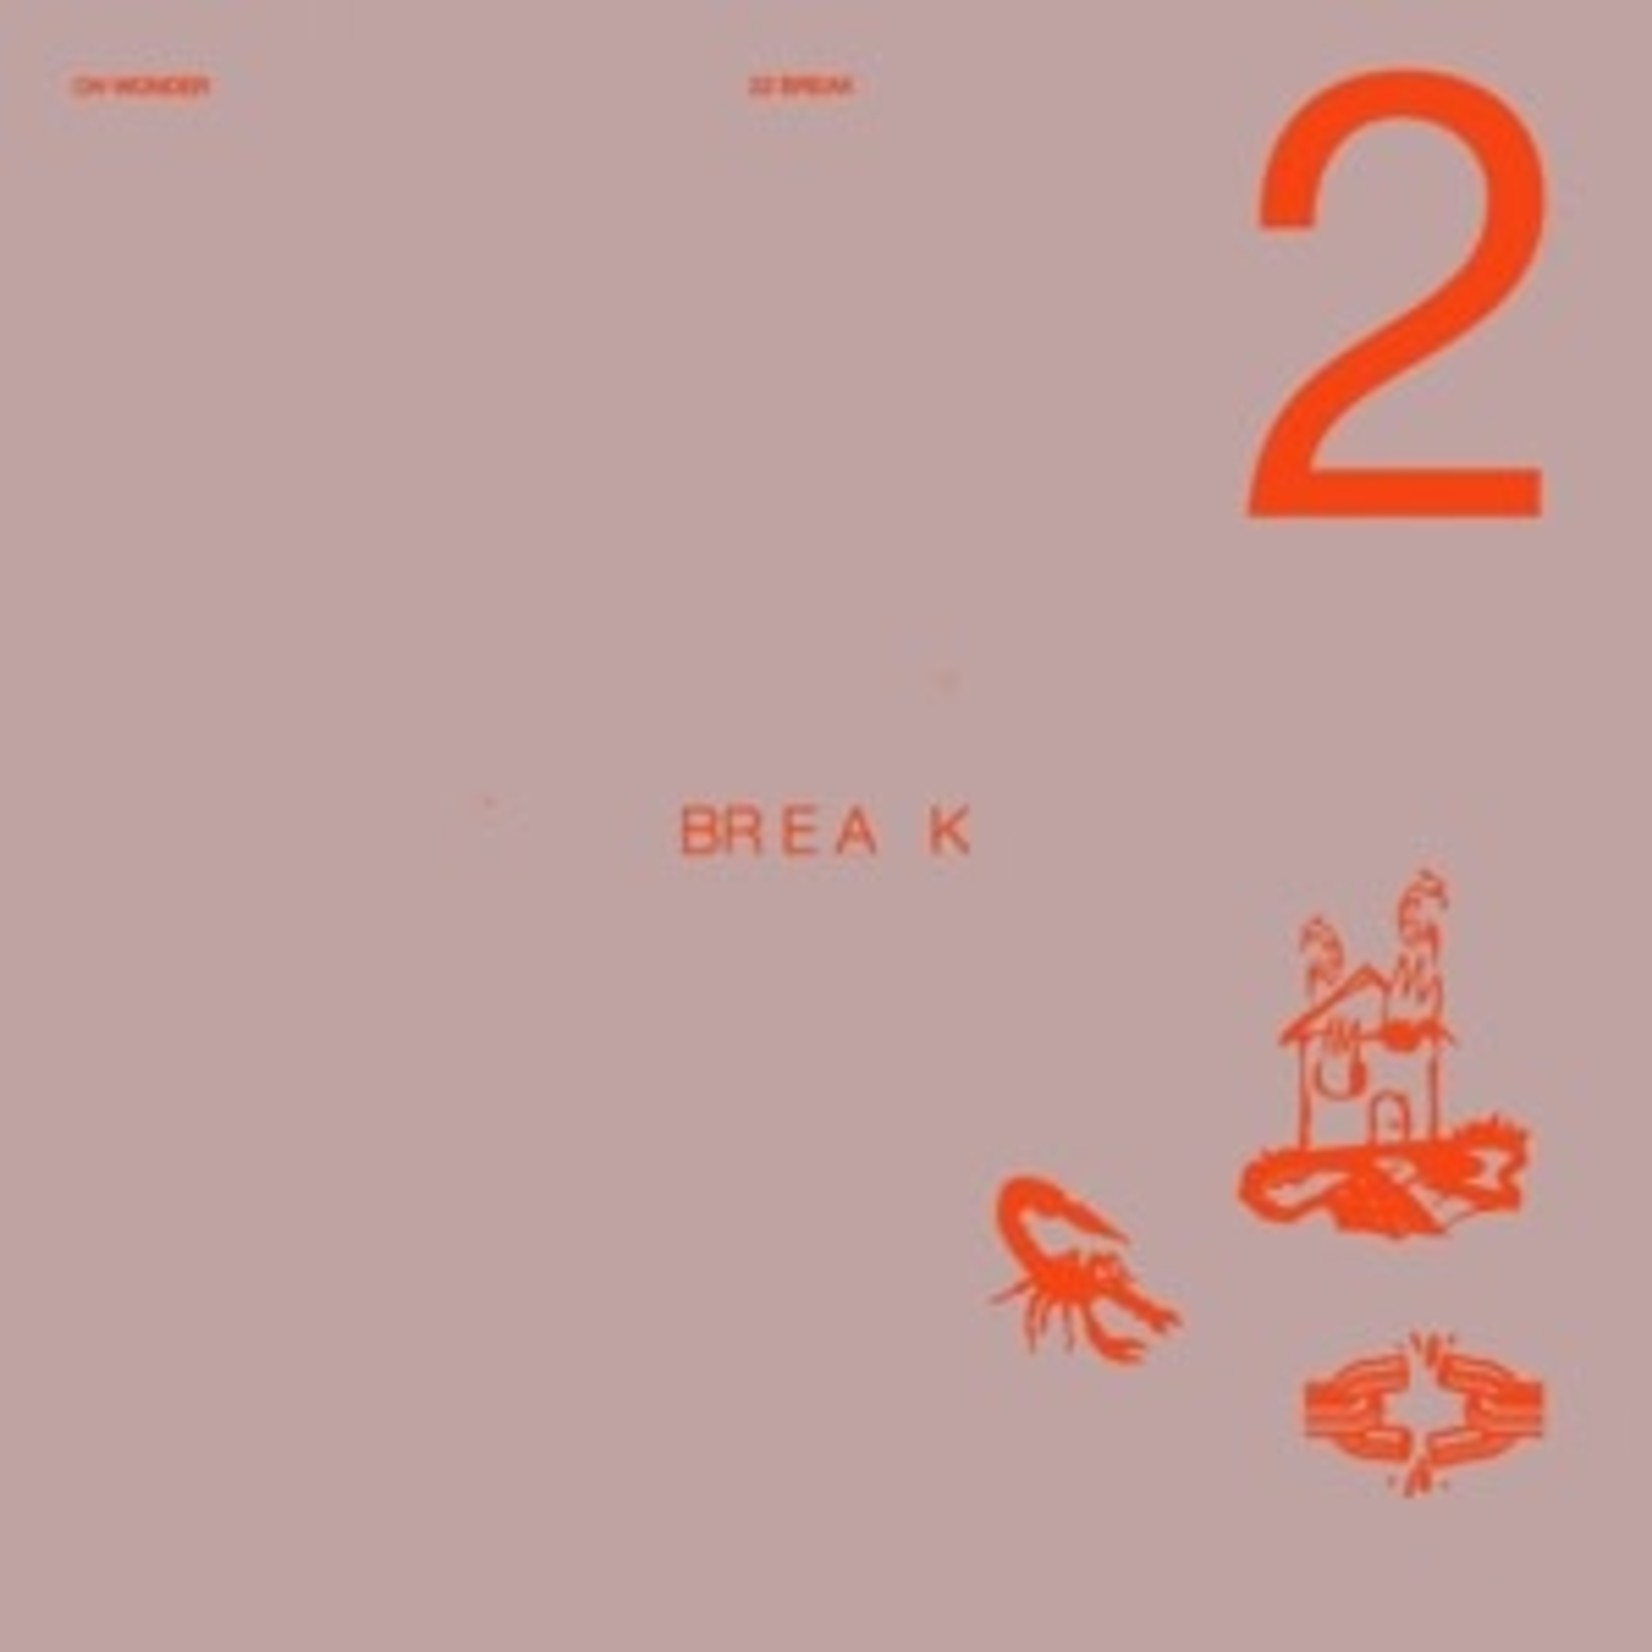 OH WONDER - 22 BREAK -HQ- (VINYL)